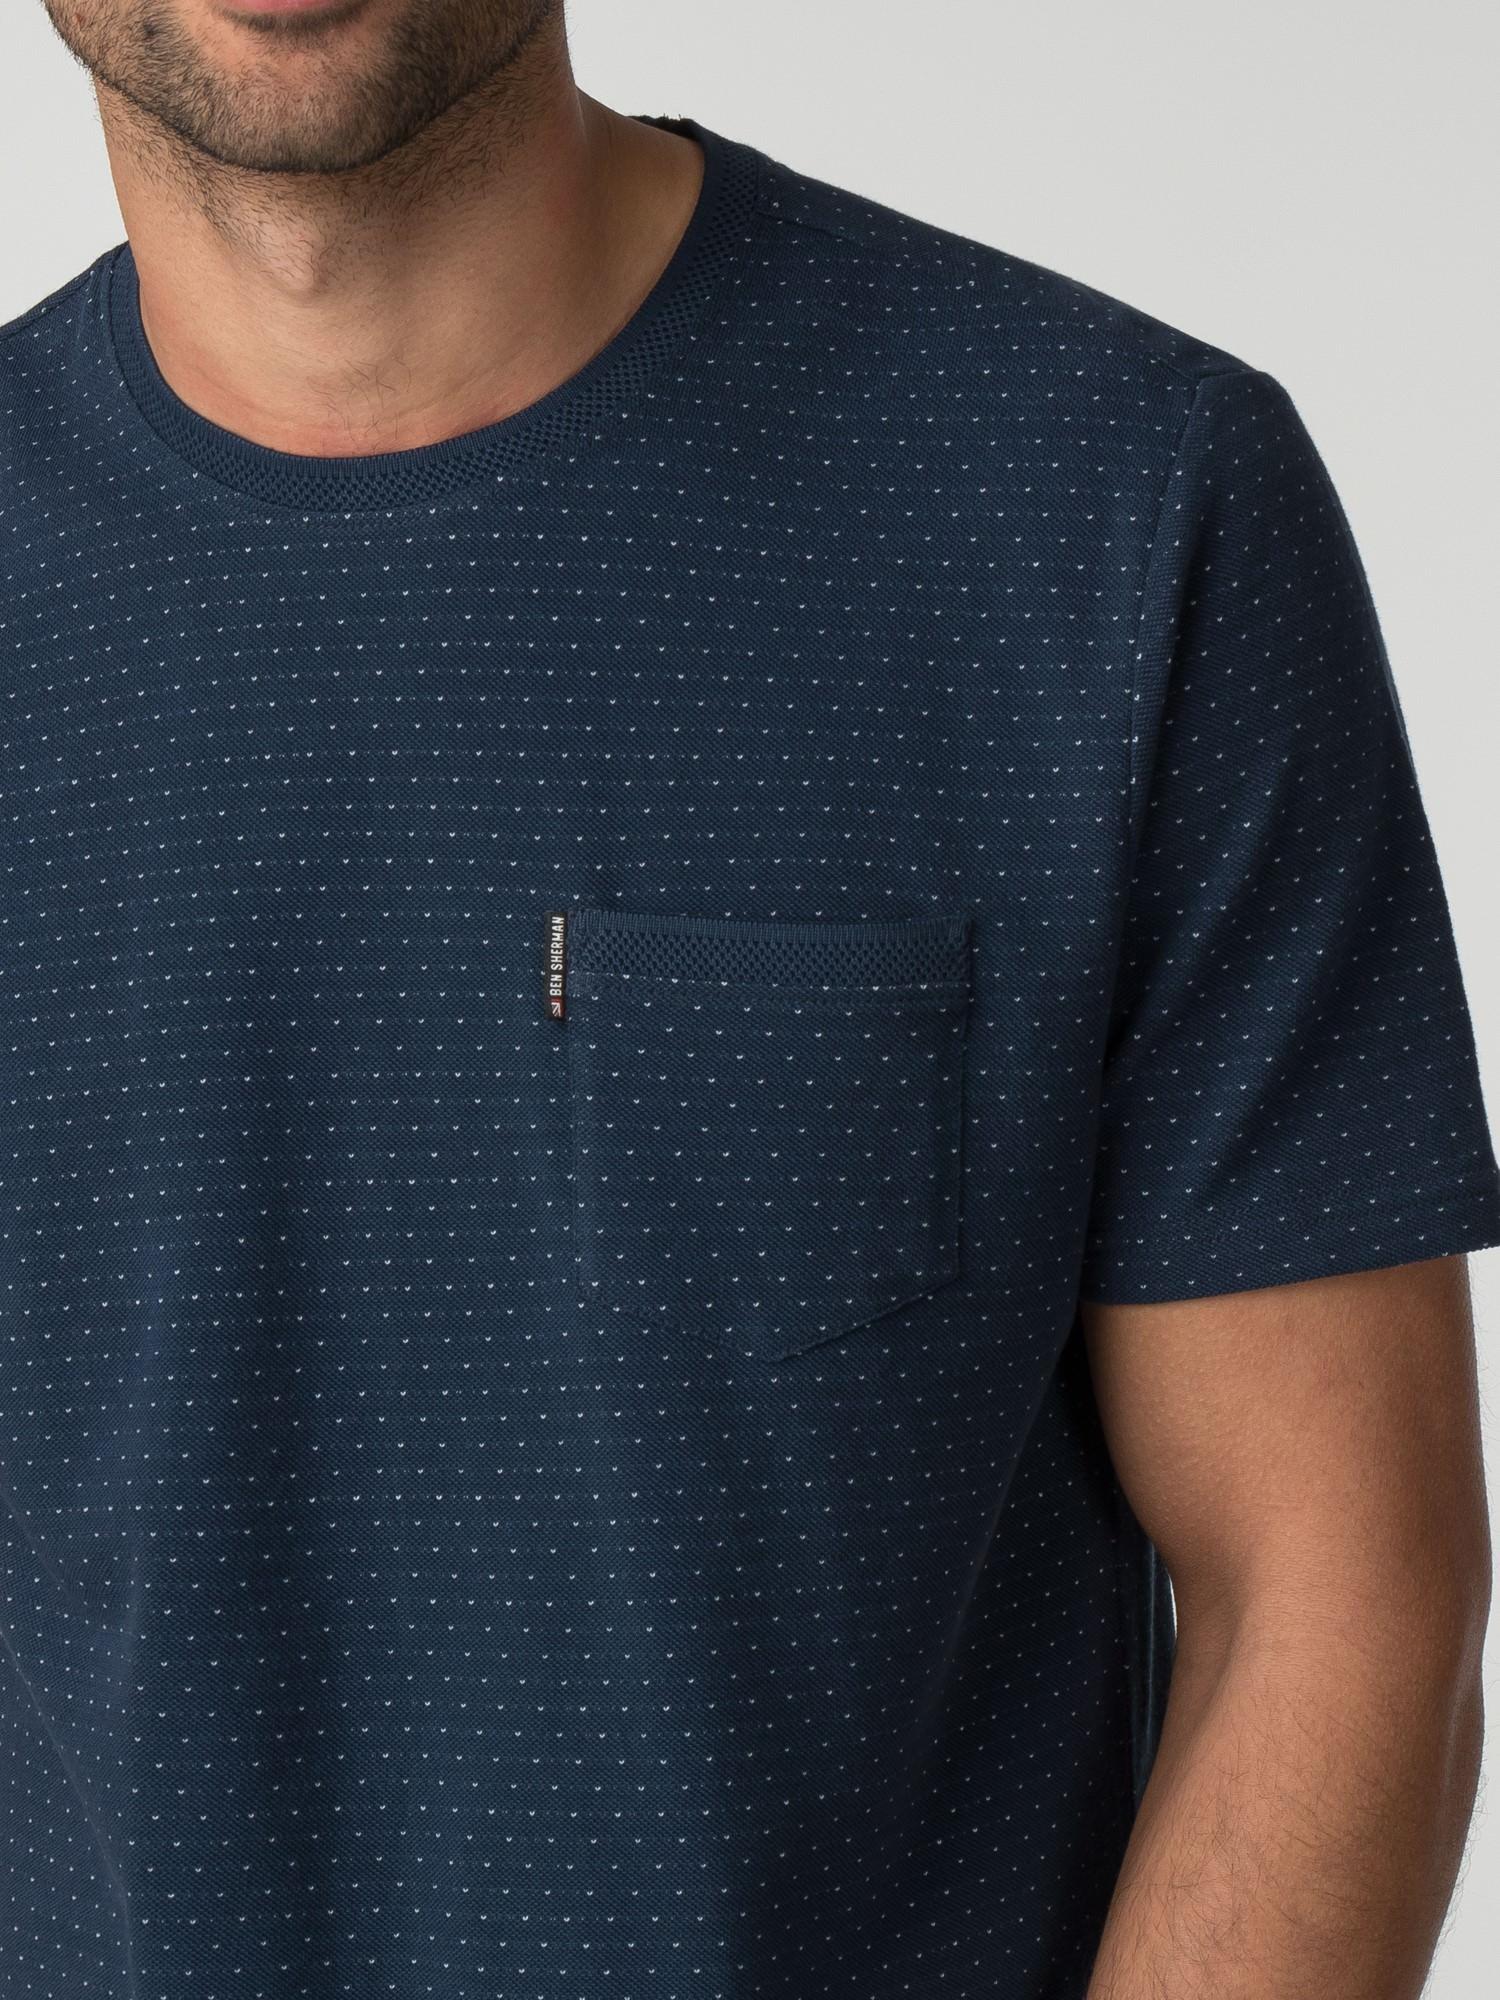 enjoy cheap price great variety models brand new The Pindot Jacquard Pique T-Shirt | Ben Sherman